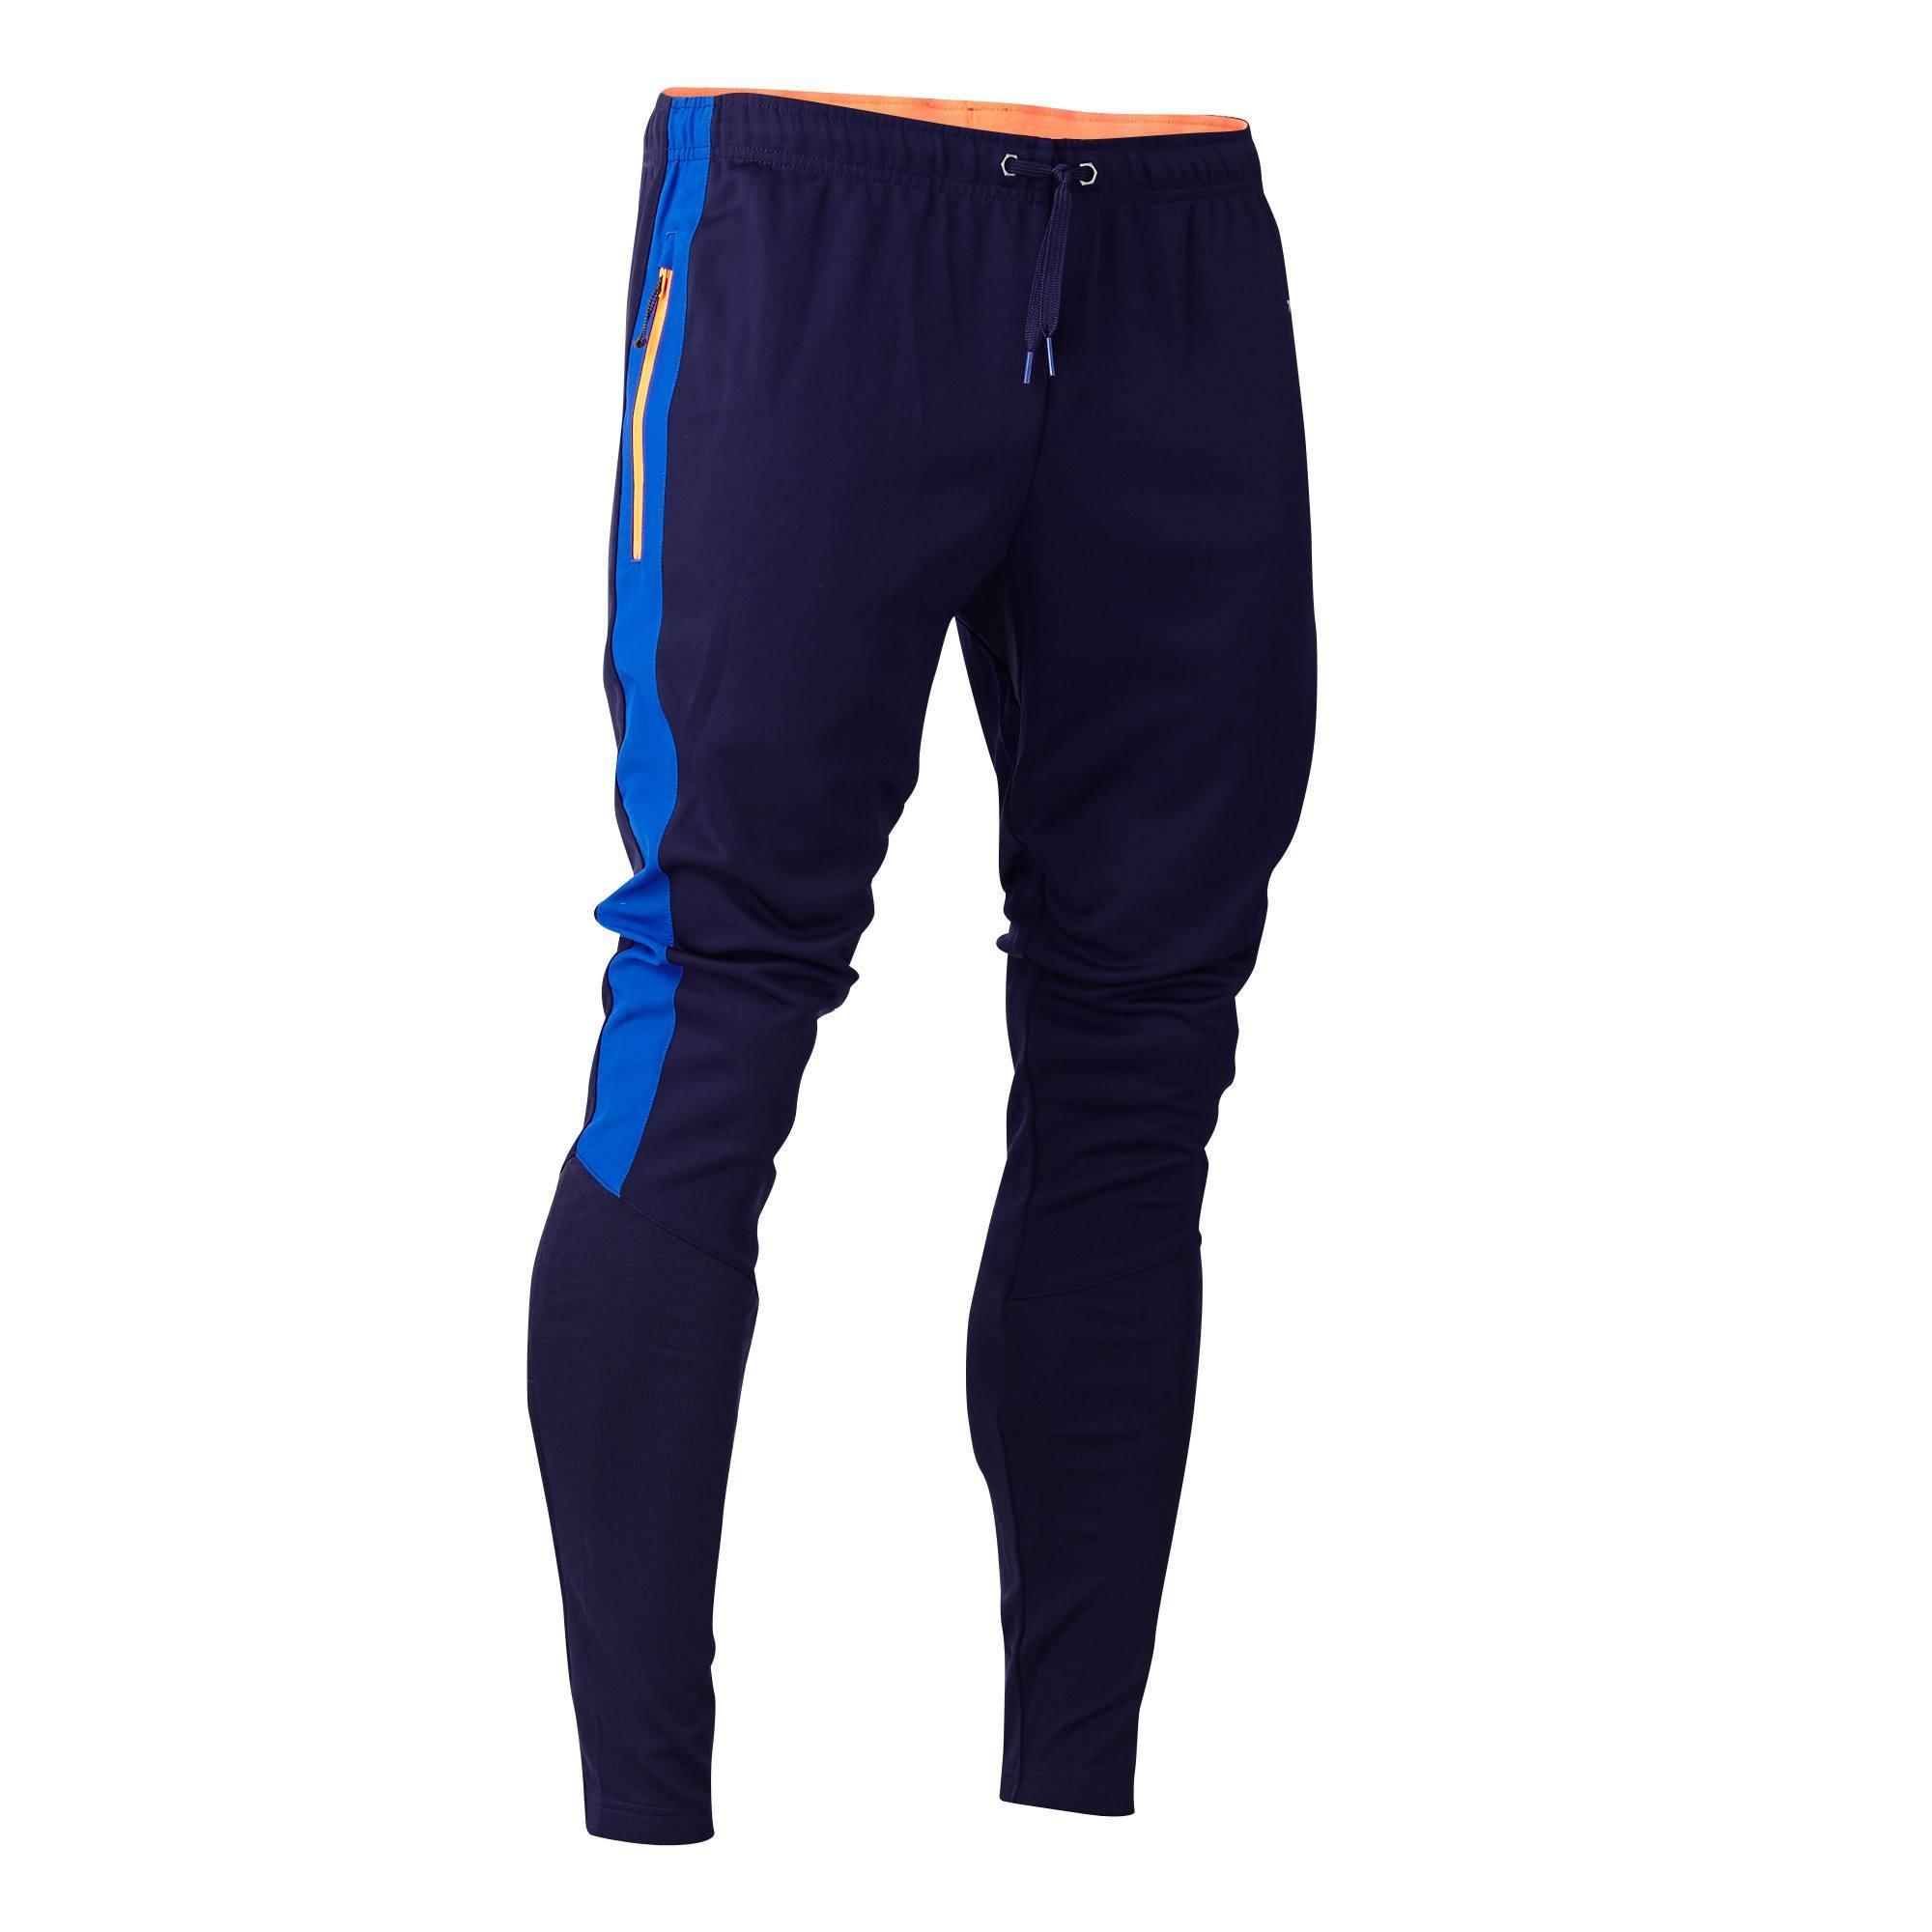 Pantalon de football adulte T500 bleu marine